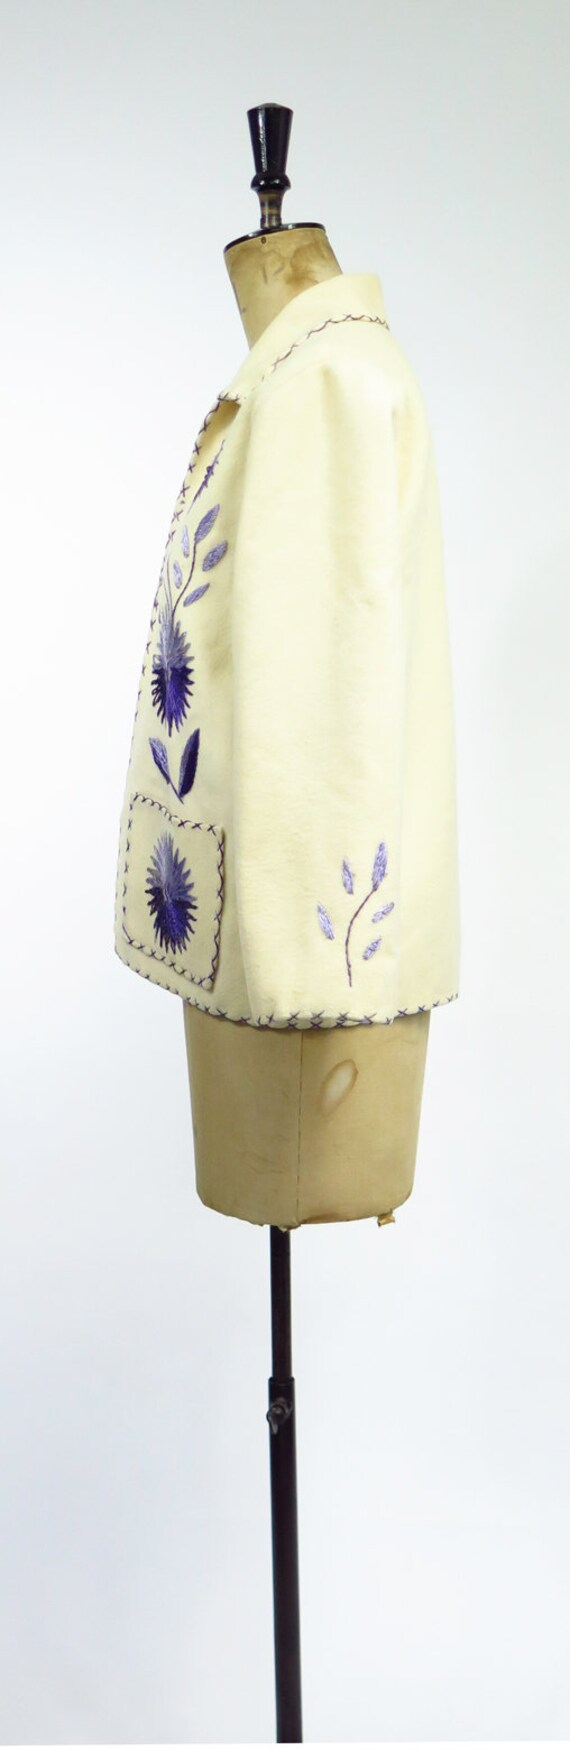 Original Vintage 1950s Mexican Souvenir Jacket - image 4